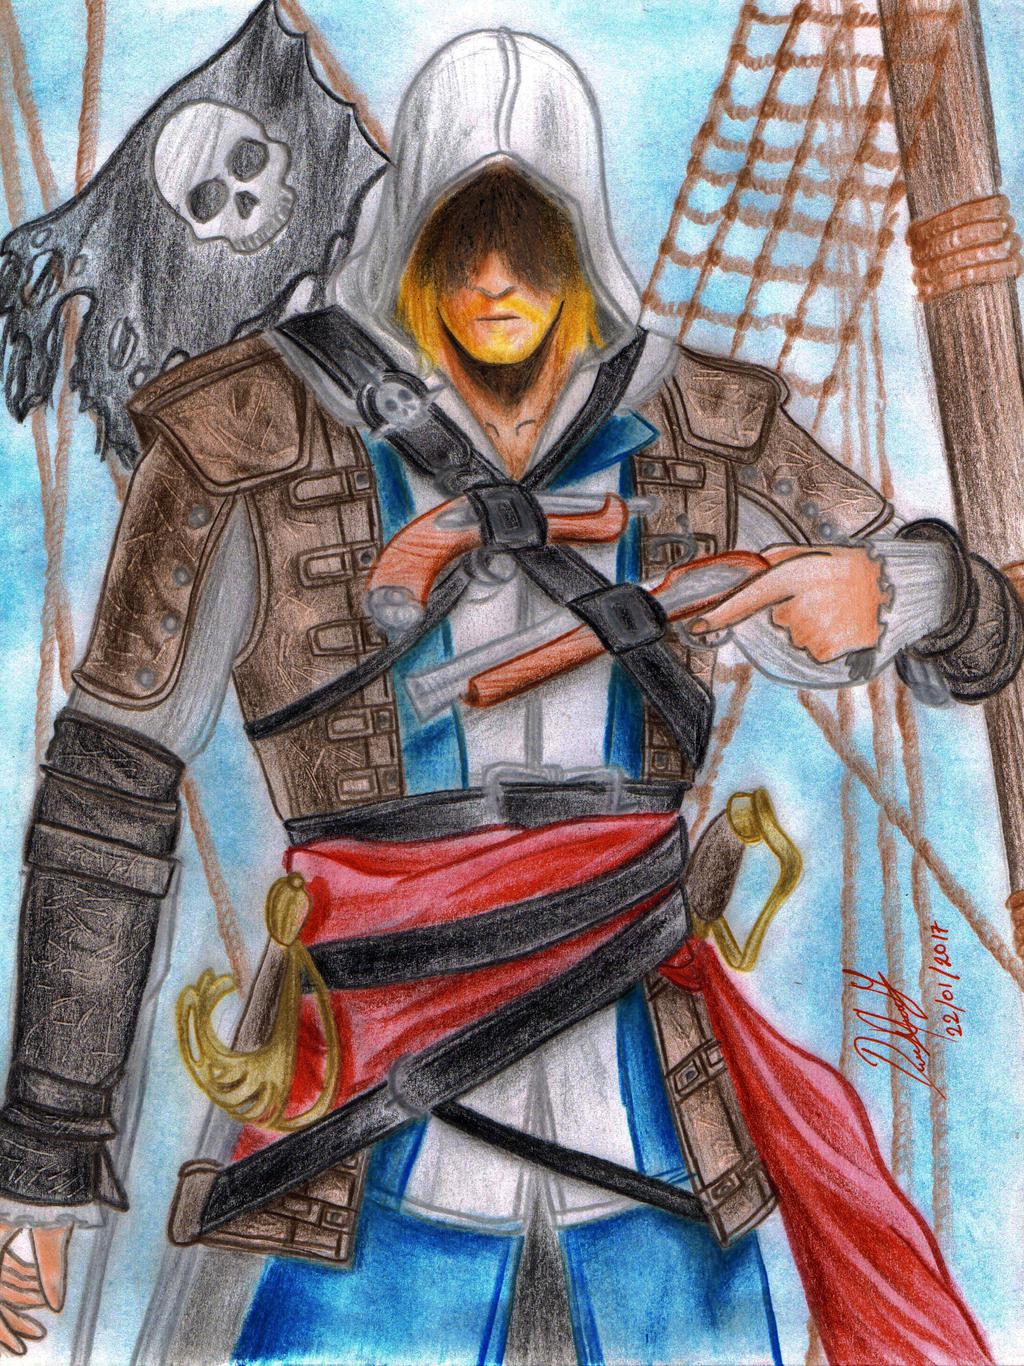 Edward Kenway (Assassin's Creed IV: Black Flag) by danielcamilo